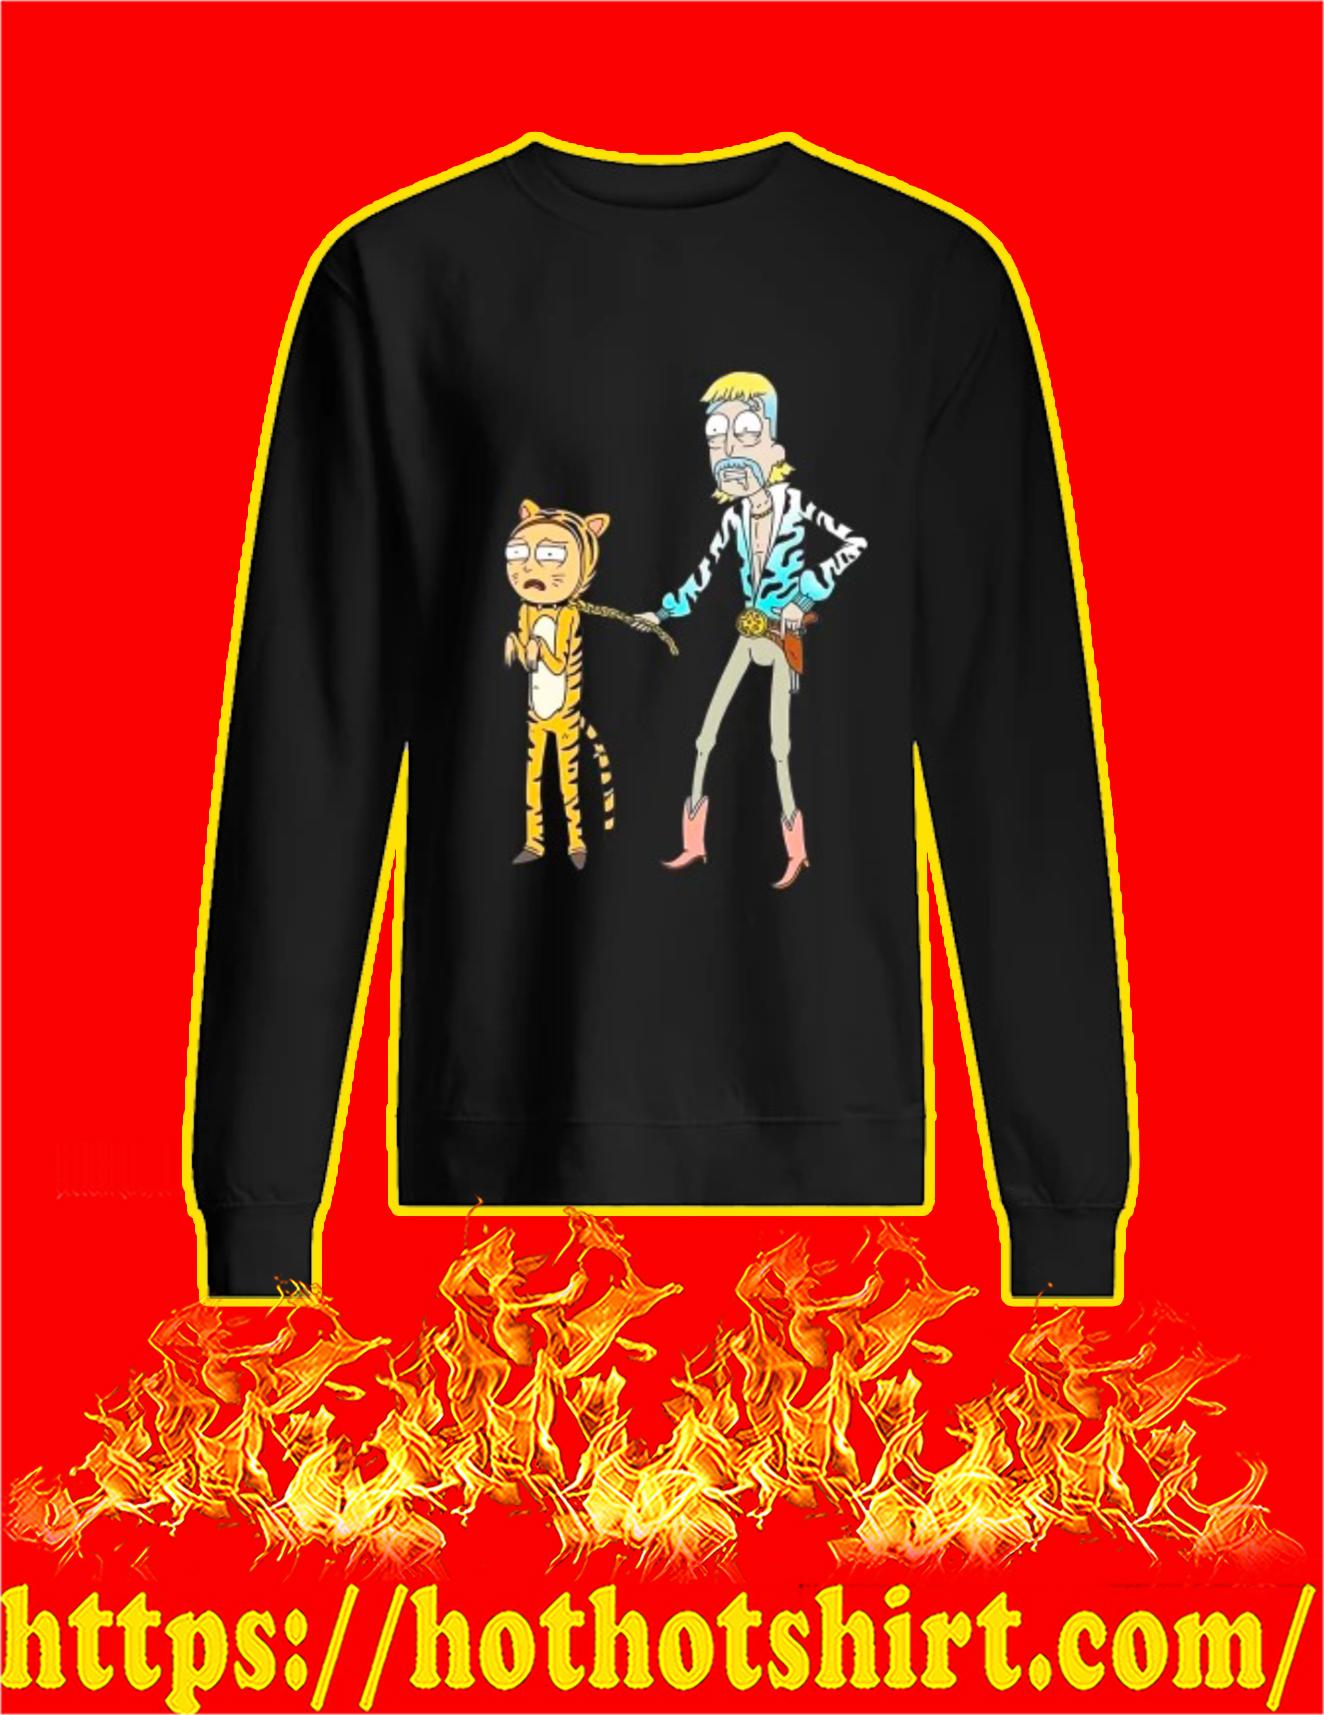 Rick and Morty Tiger King t-sweatshirt